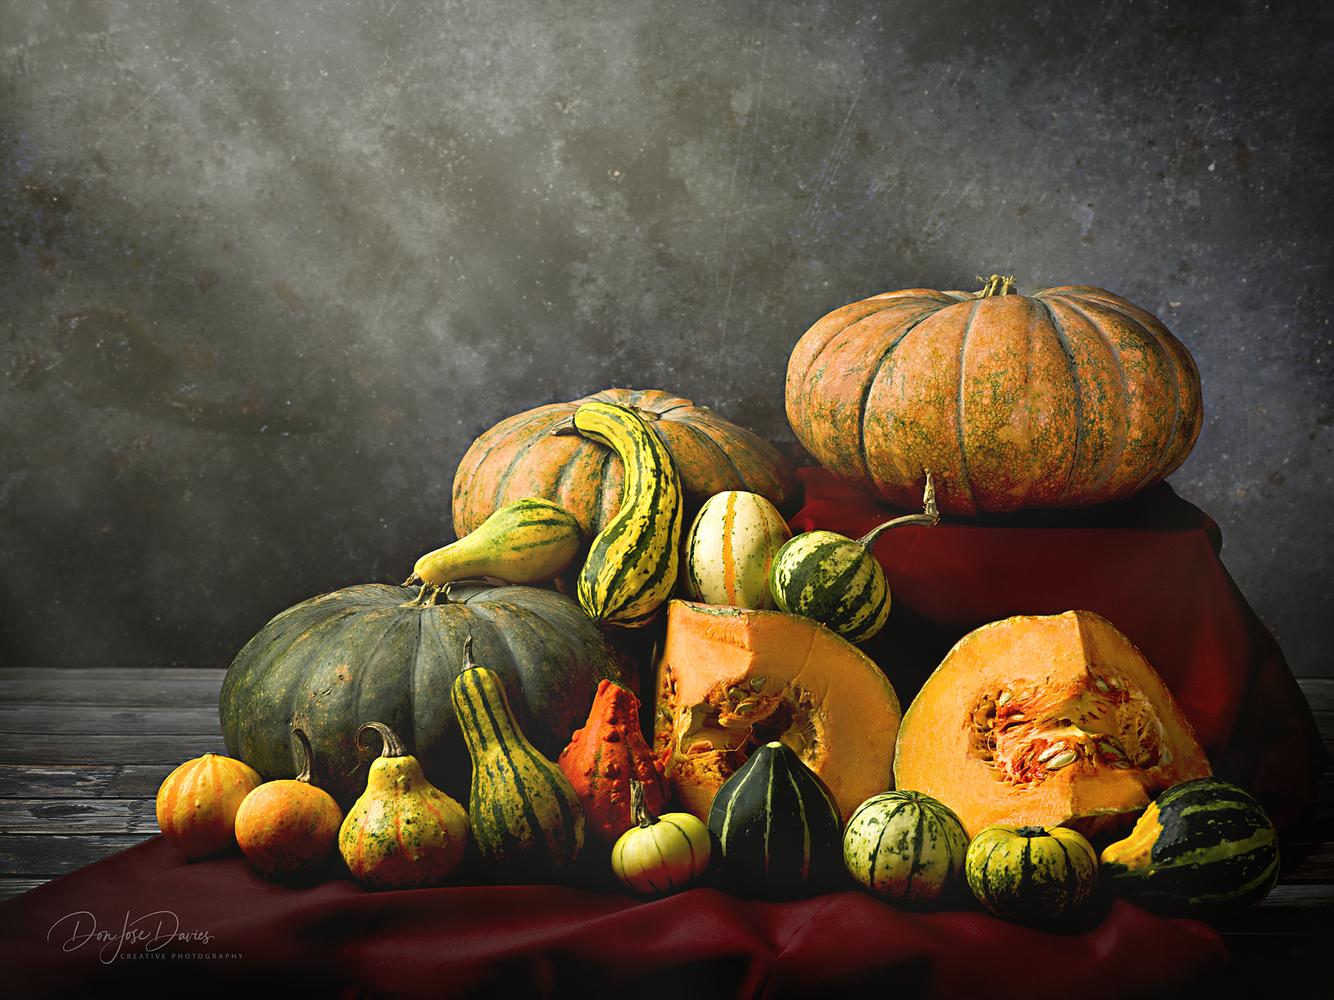 Pumpkins by Don Jose Romulo Davies